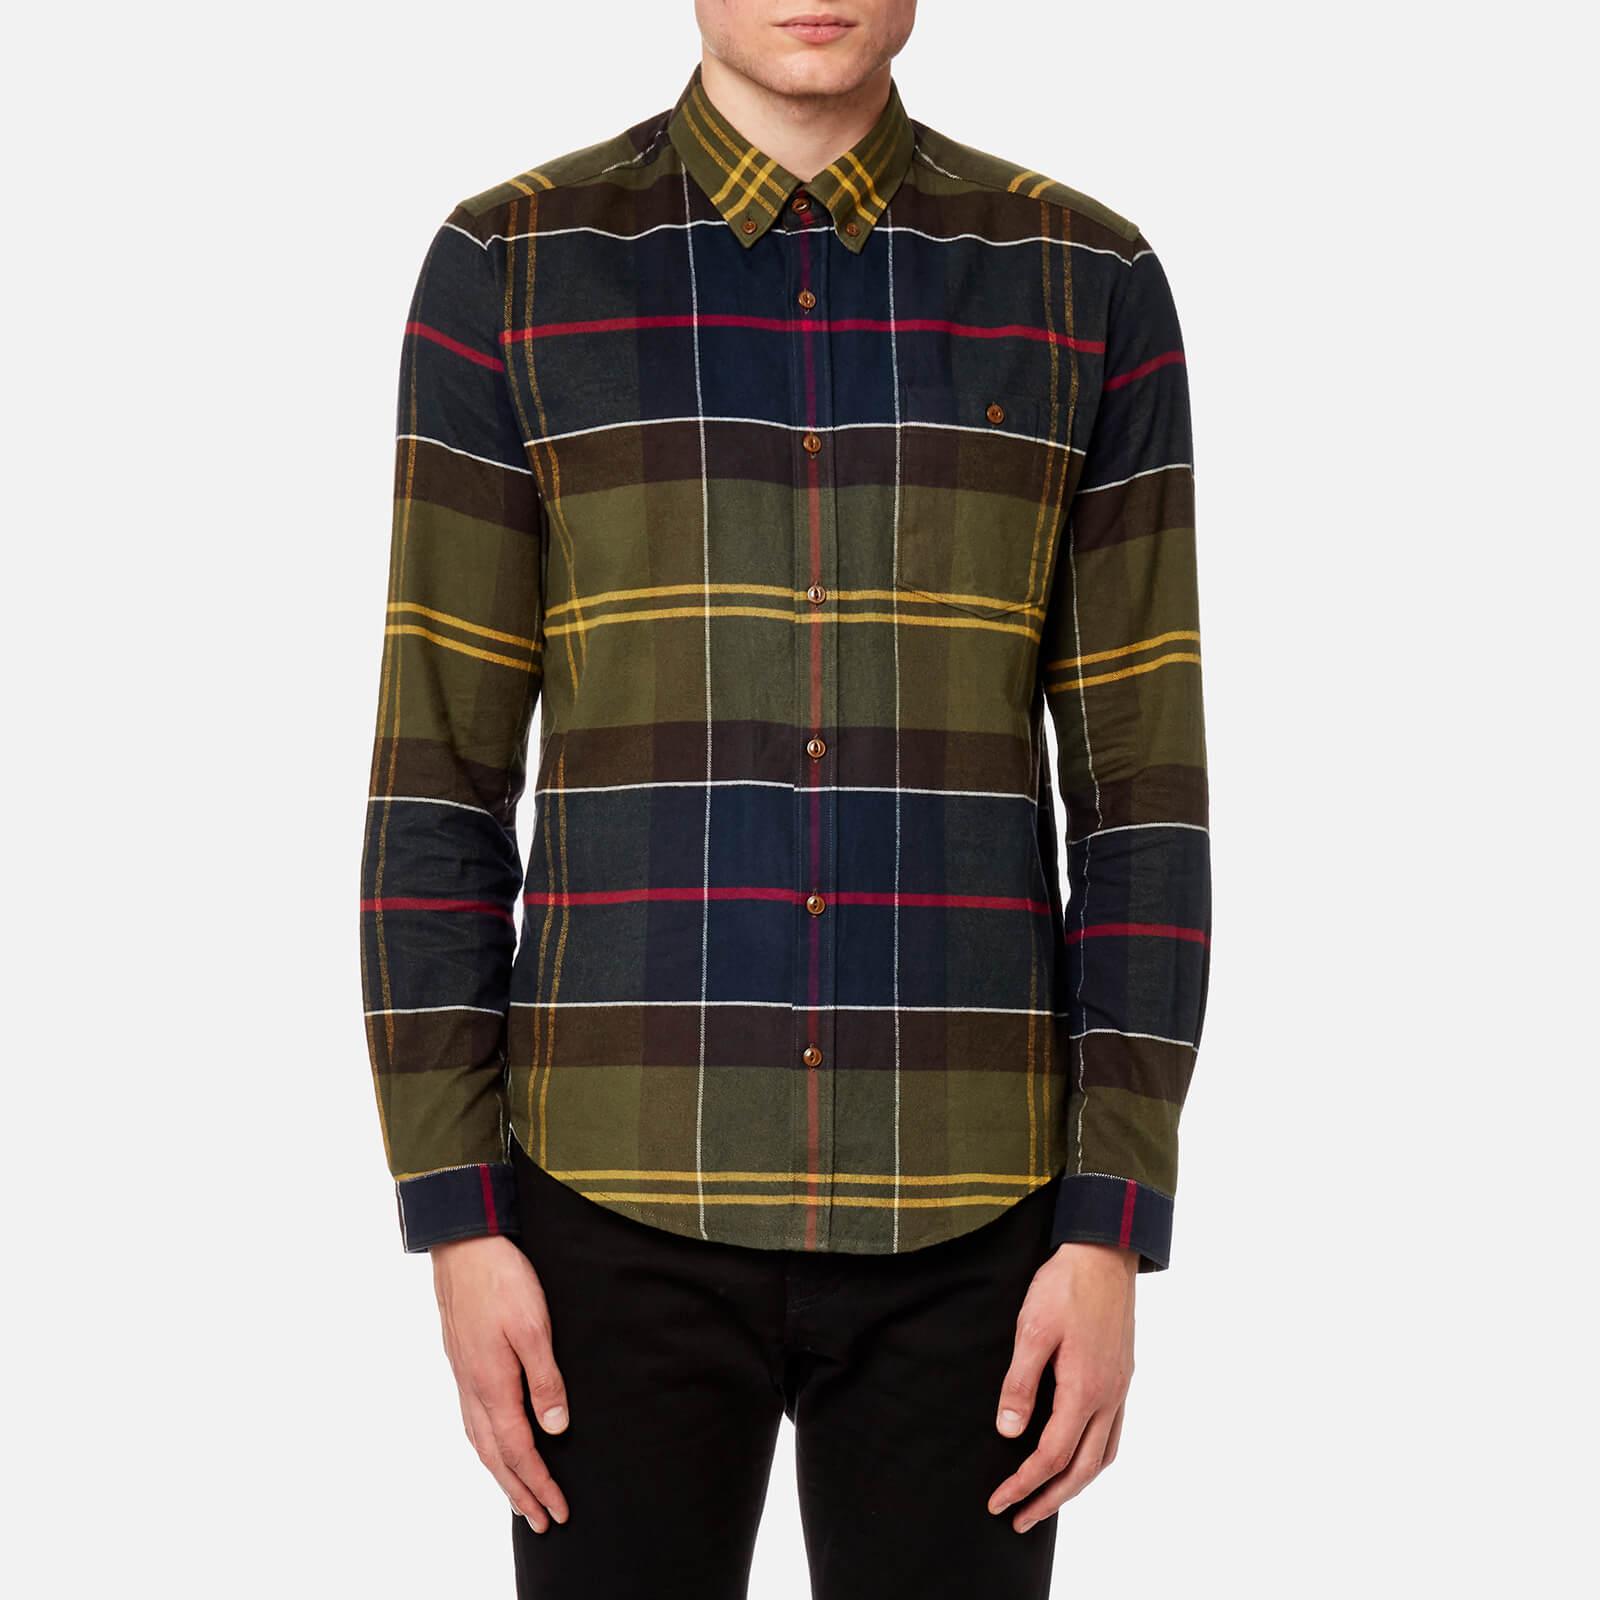 062fbe696d648 Barbour Heritage Men's Johnny Tartan Long Sleeve Shirt - Moss Green